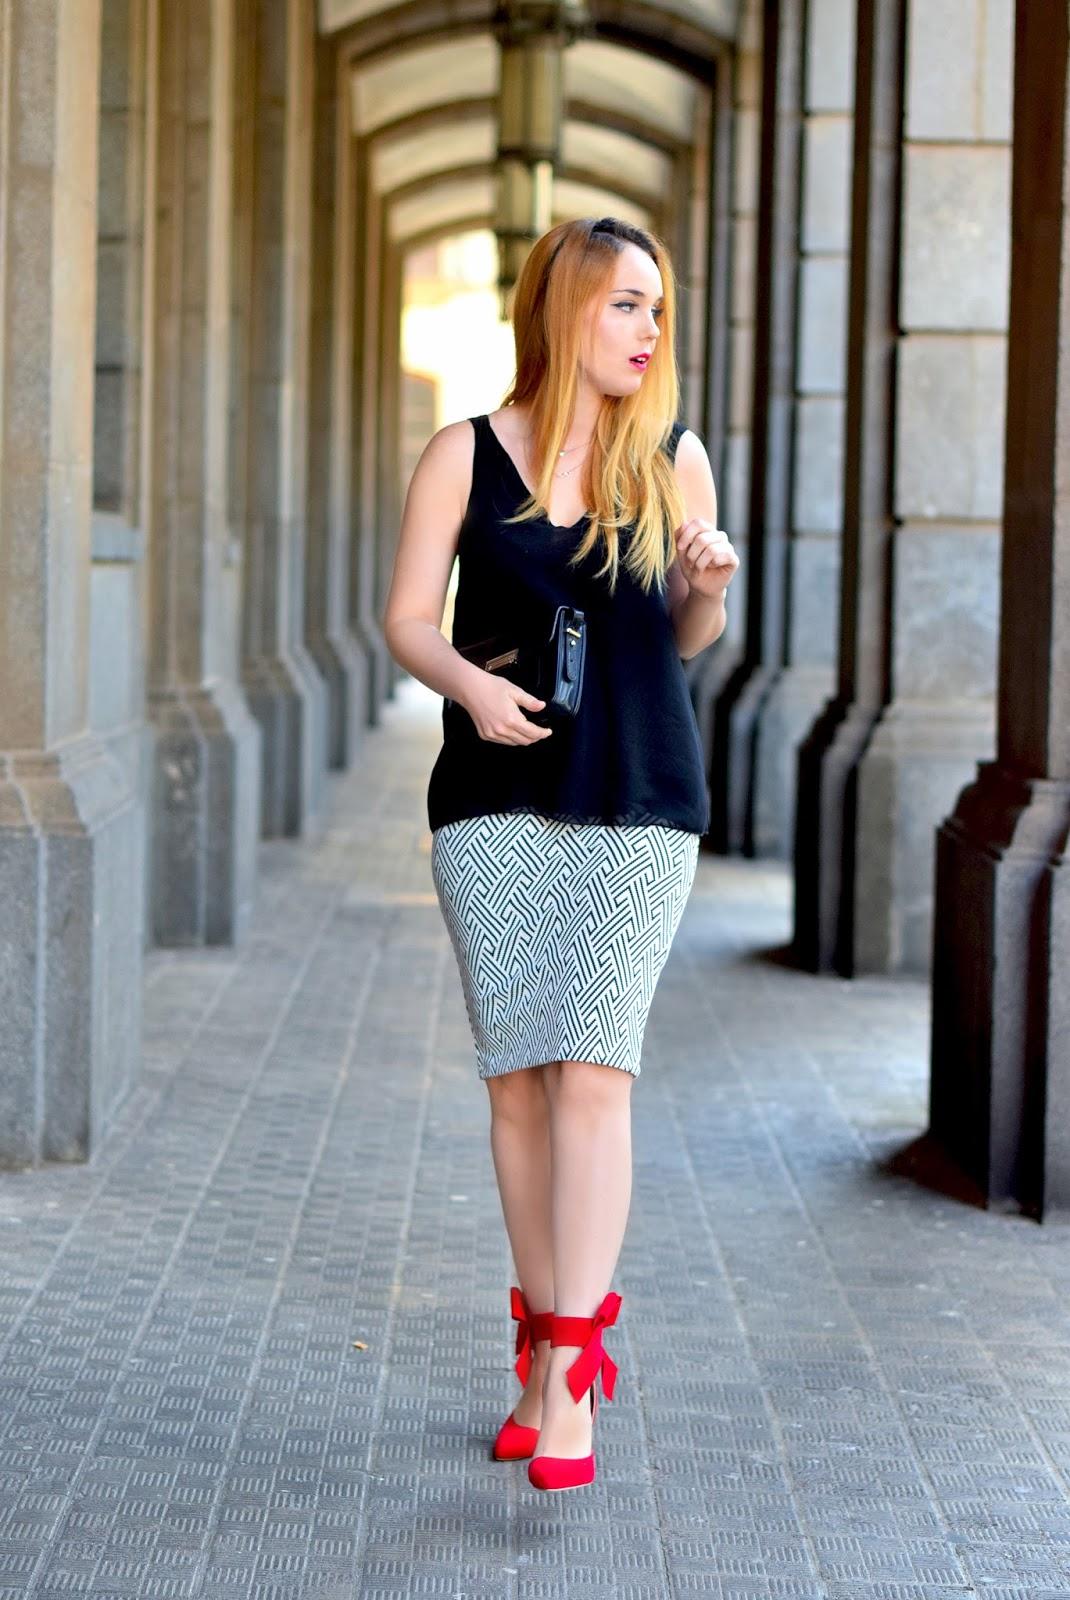 nery hdez, total look zara, sophia webster clon, geometric print, falda lápiz